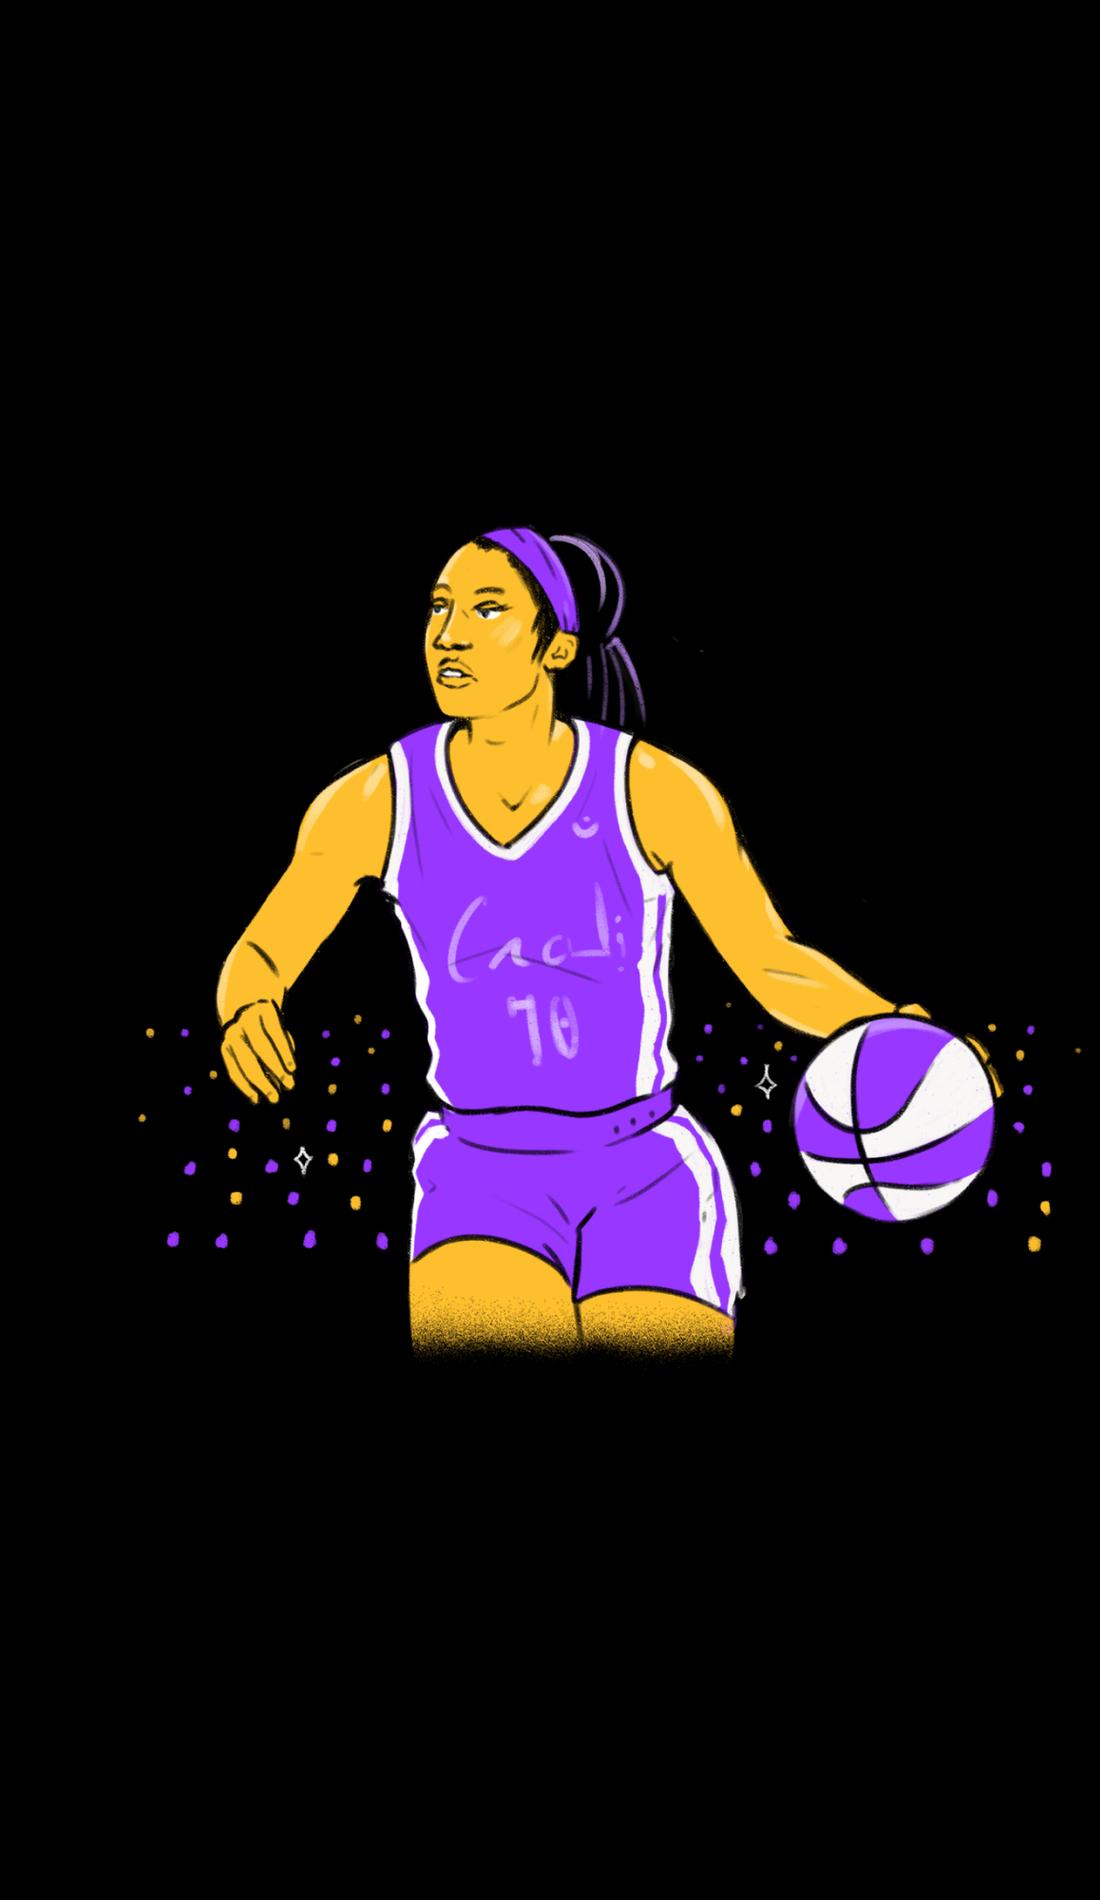 A UC Santa Barbara Gauchos Womens Basketball live event